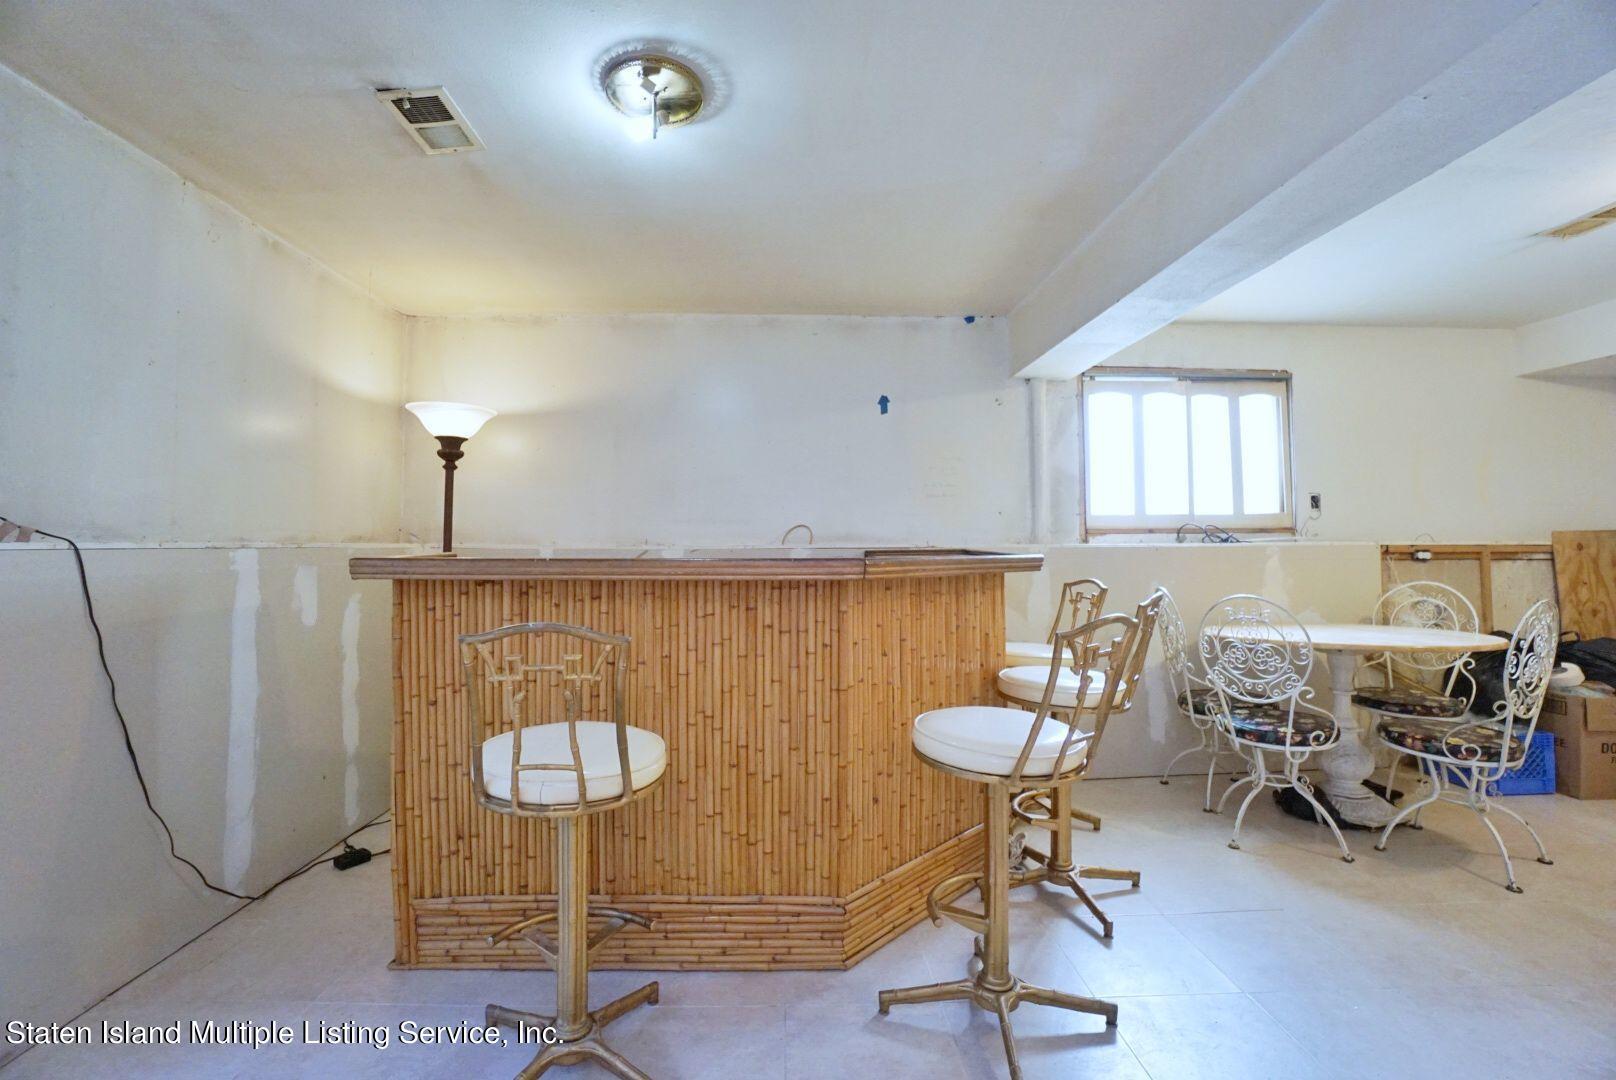 Single Family - Detached 94 Cranford Avenue  Staten Island, NY 10306, MLS-1146620-38